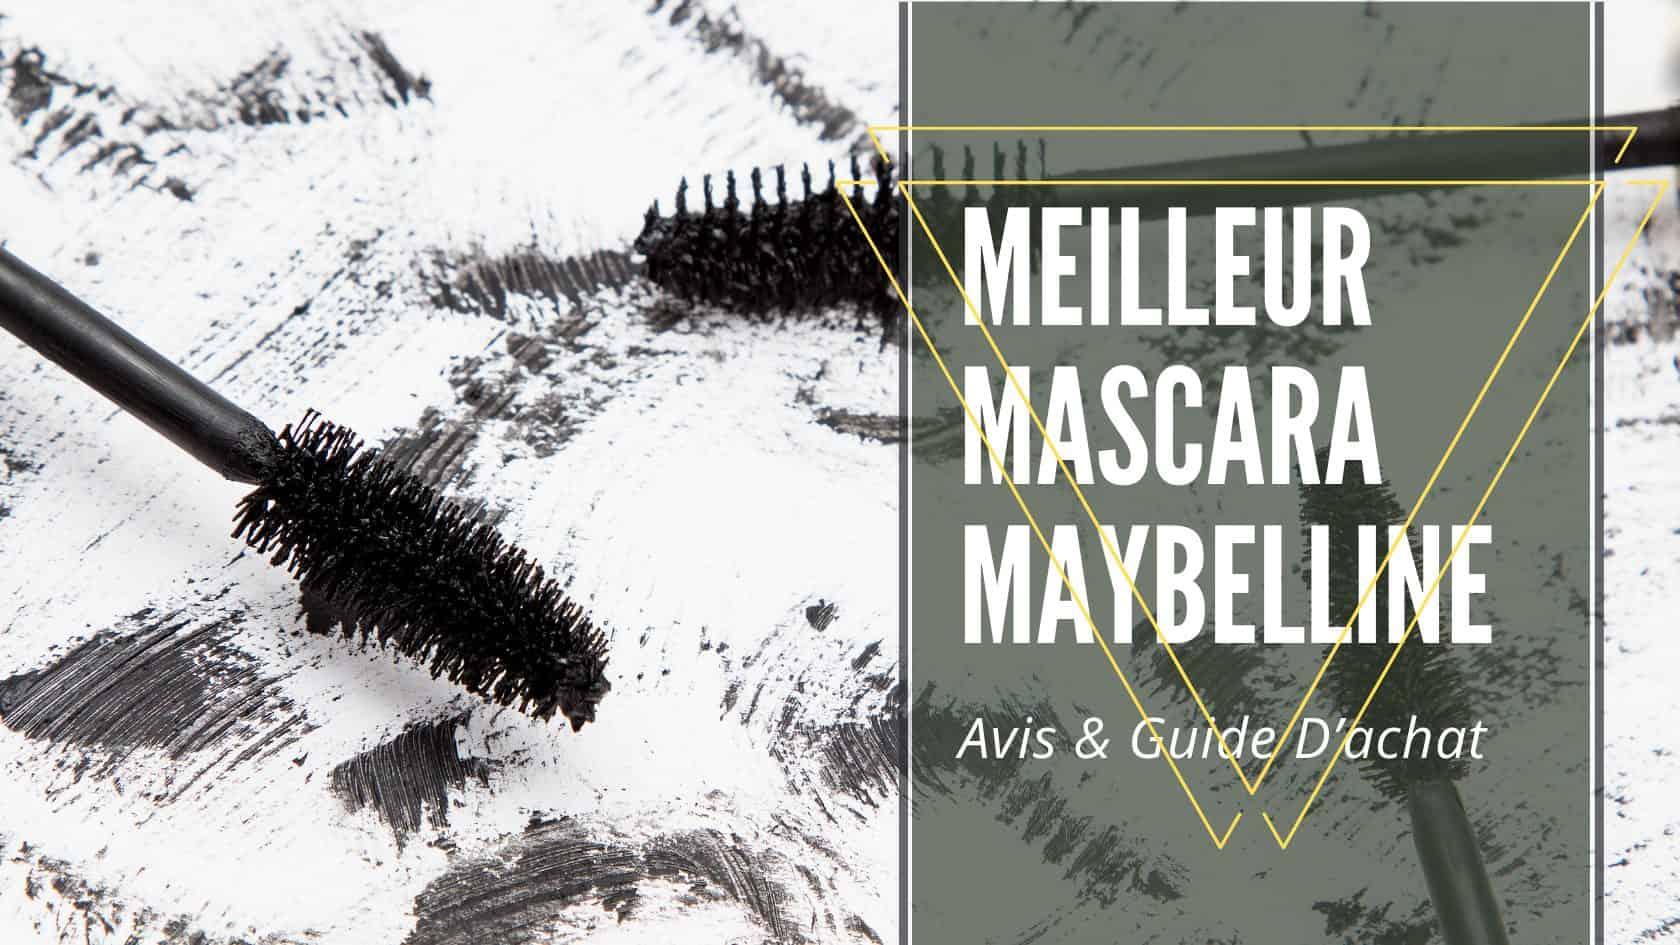 meilleur mascara maybelline